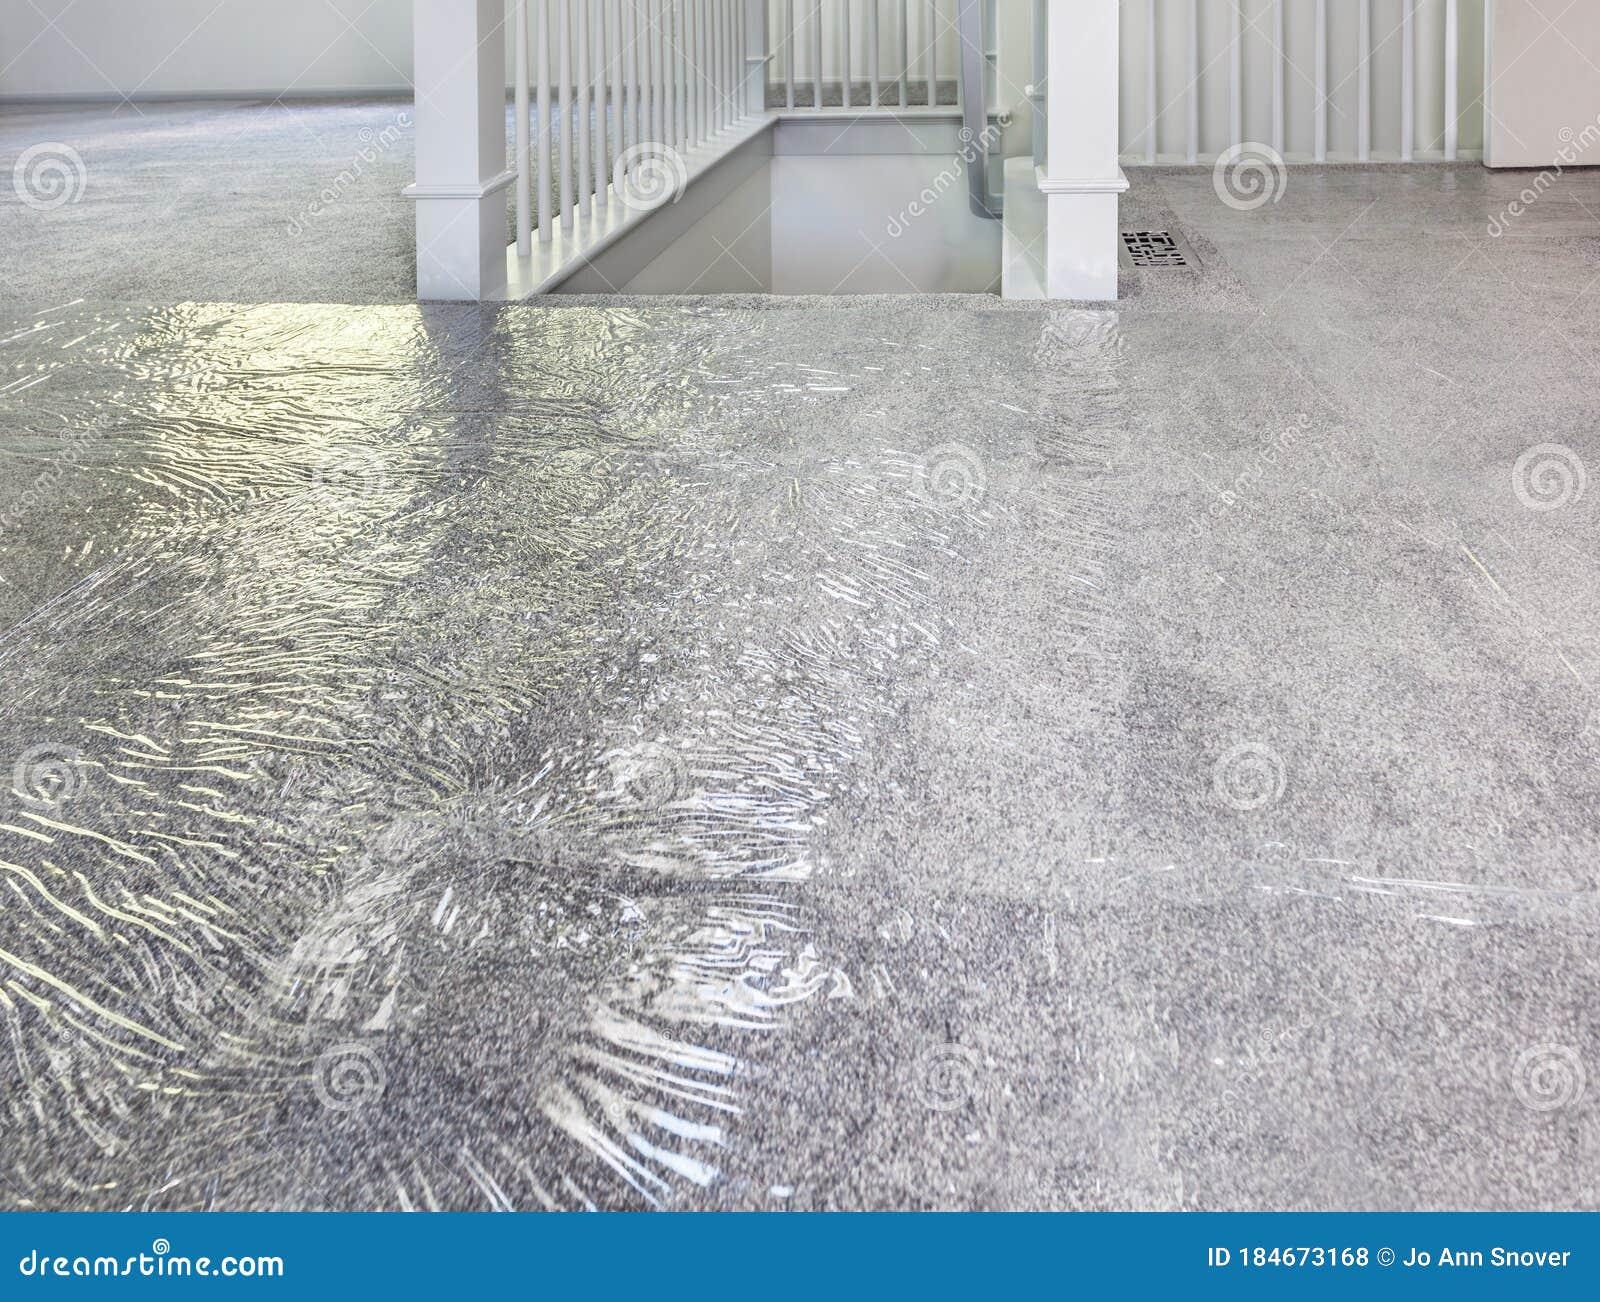 Plastic Carpet Protection Over Carpet Stock Photo Image Of Pristine Tarp 184673168